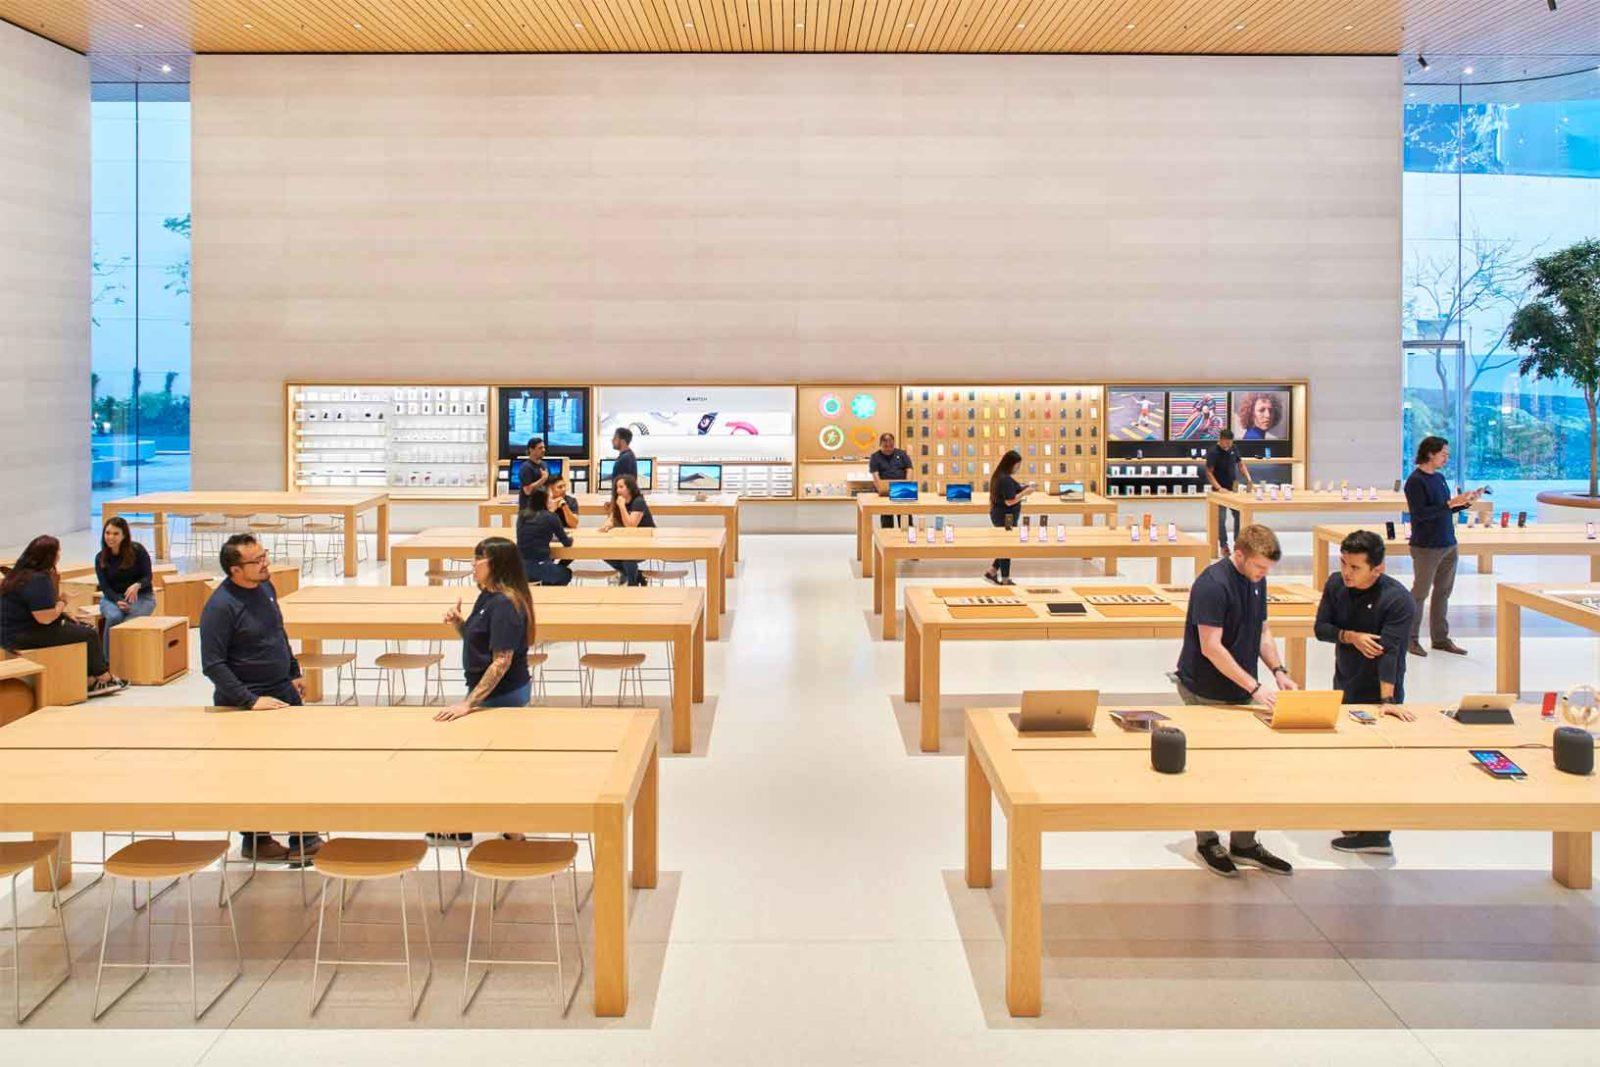 Apple Antara aprirà venerdì a Città del Messico